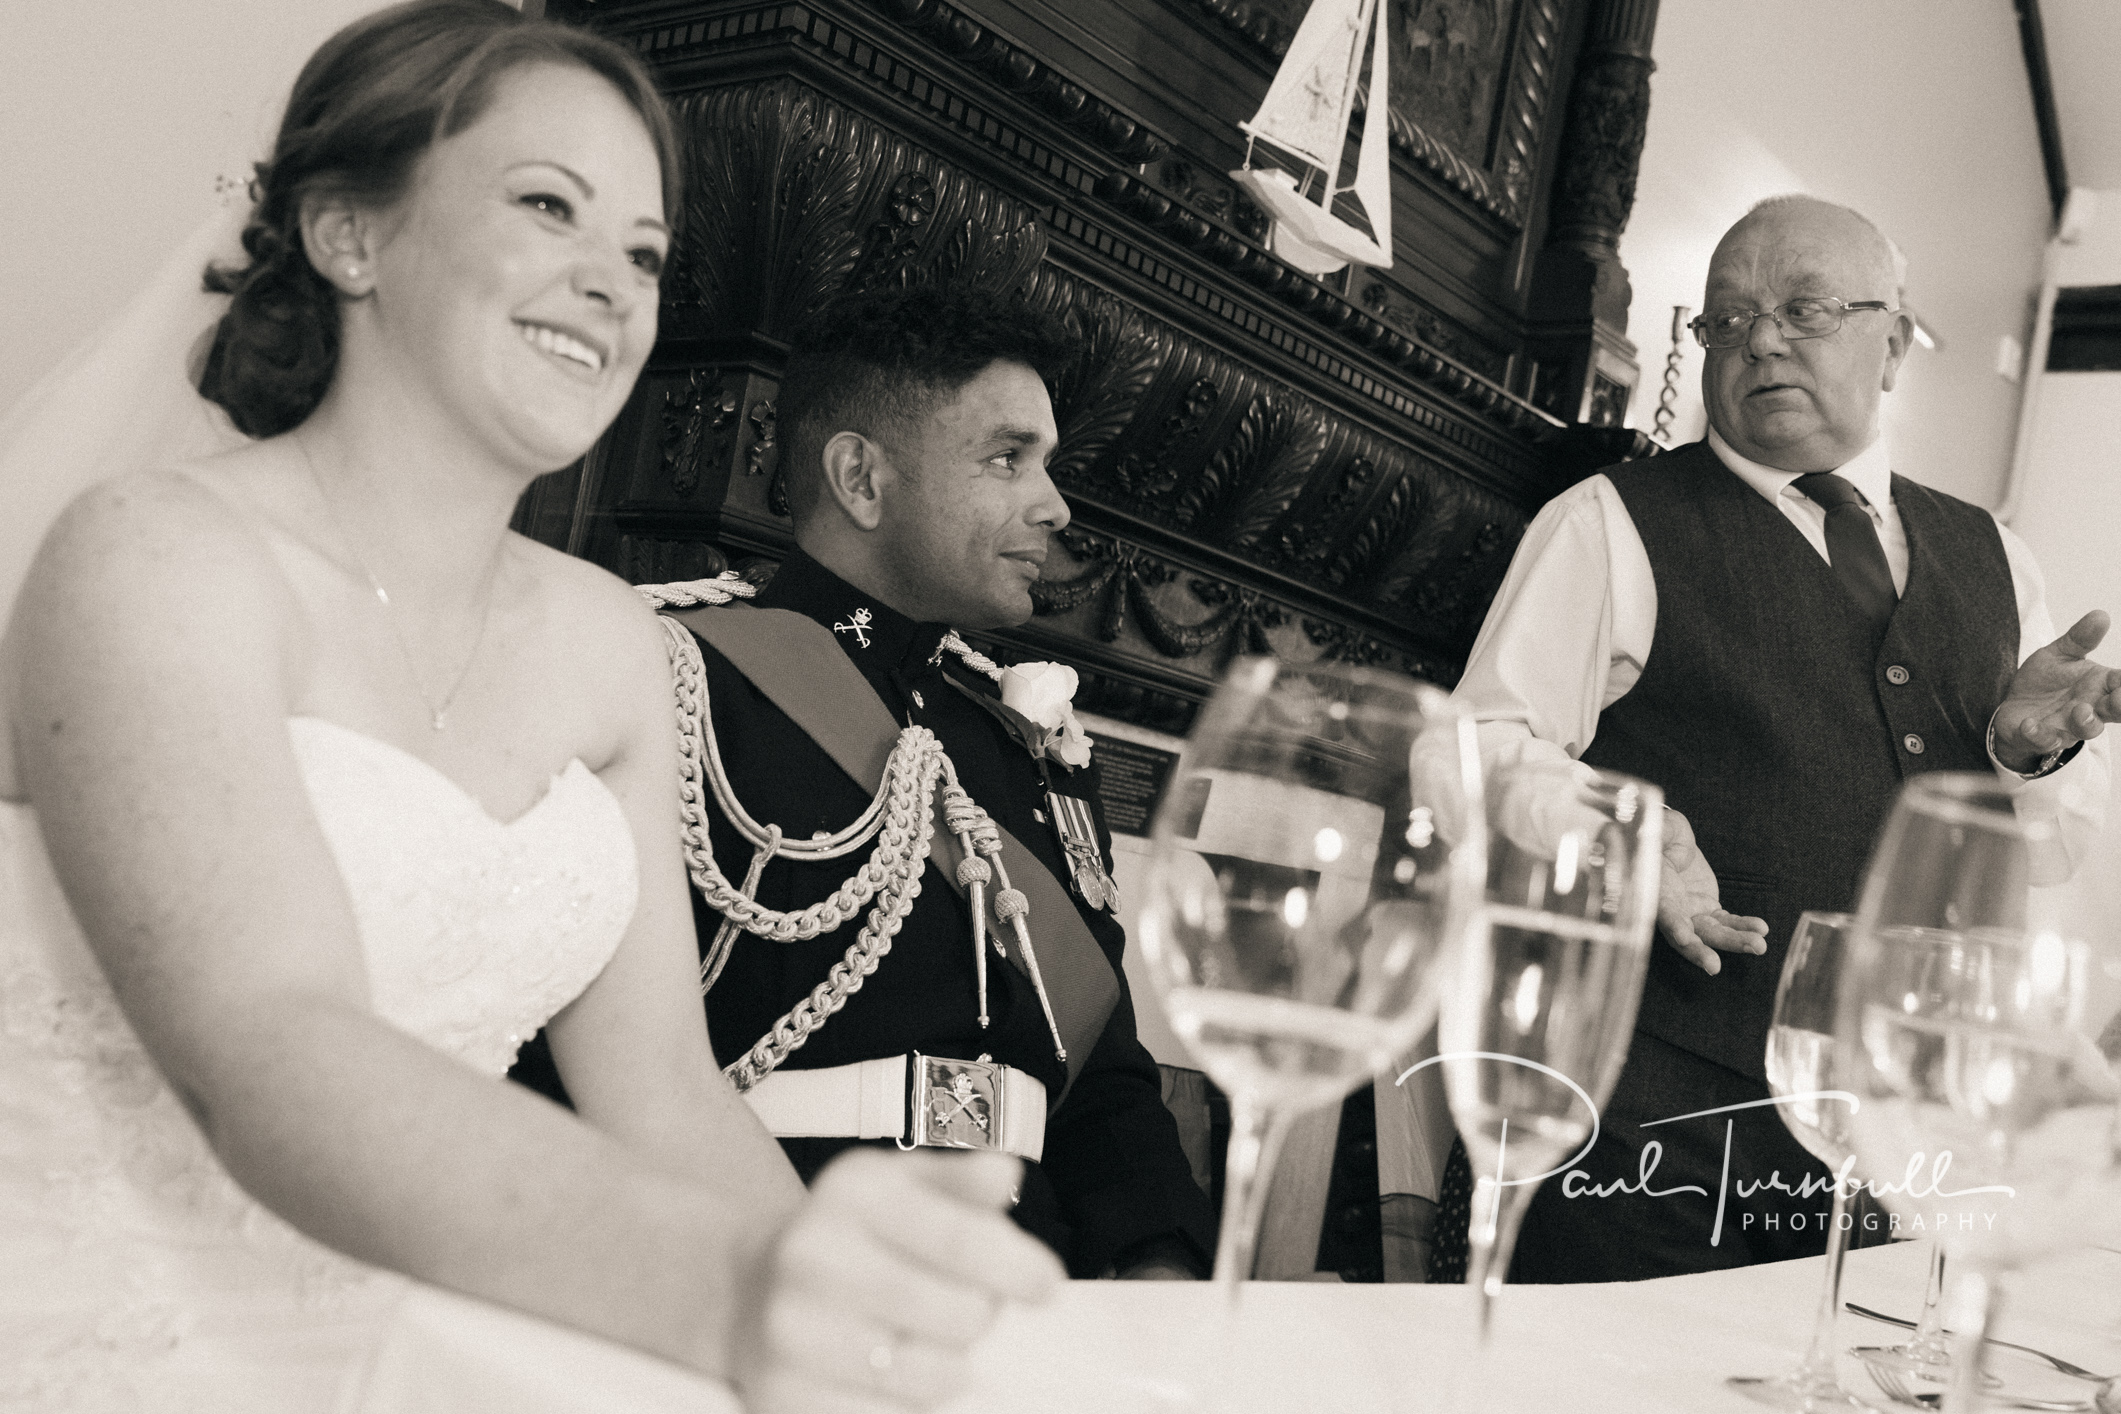 wedding-photographer-south-dalton-walkington-yorkshire-emma-james-062.jpg